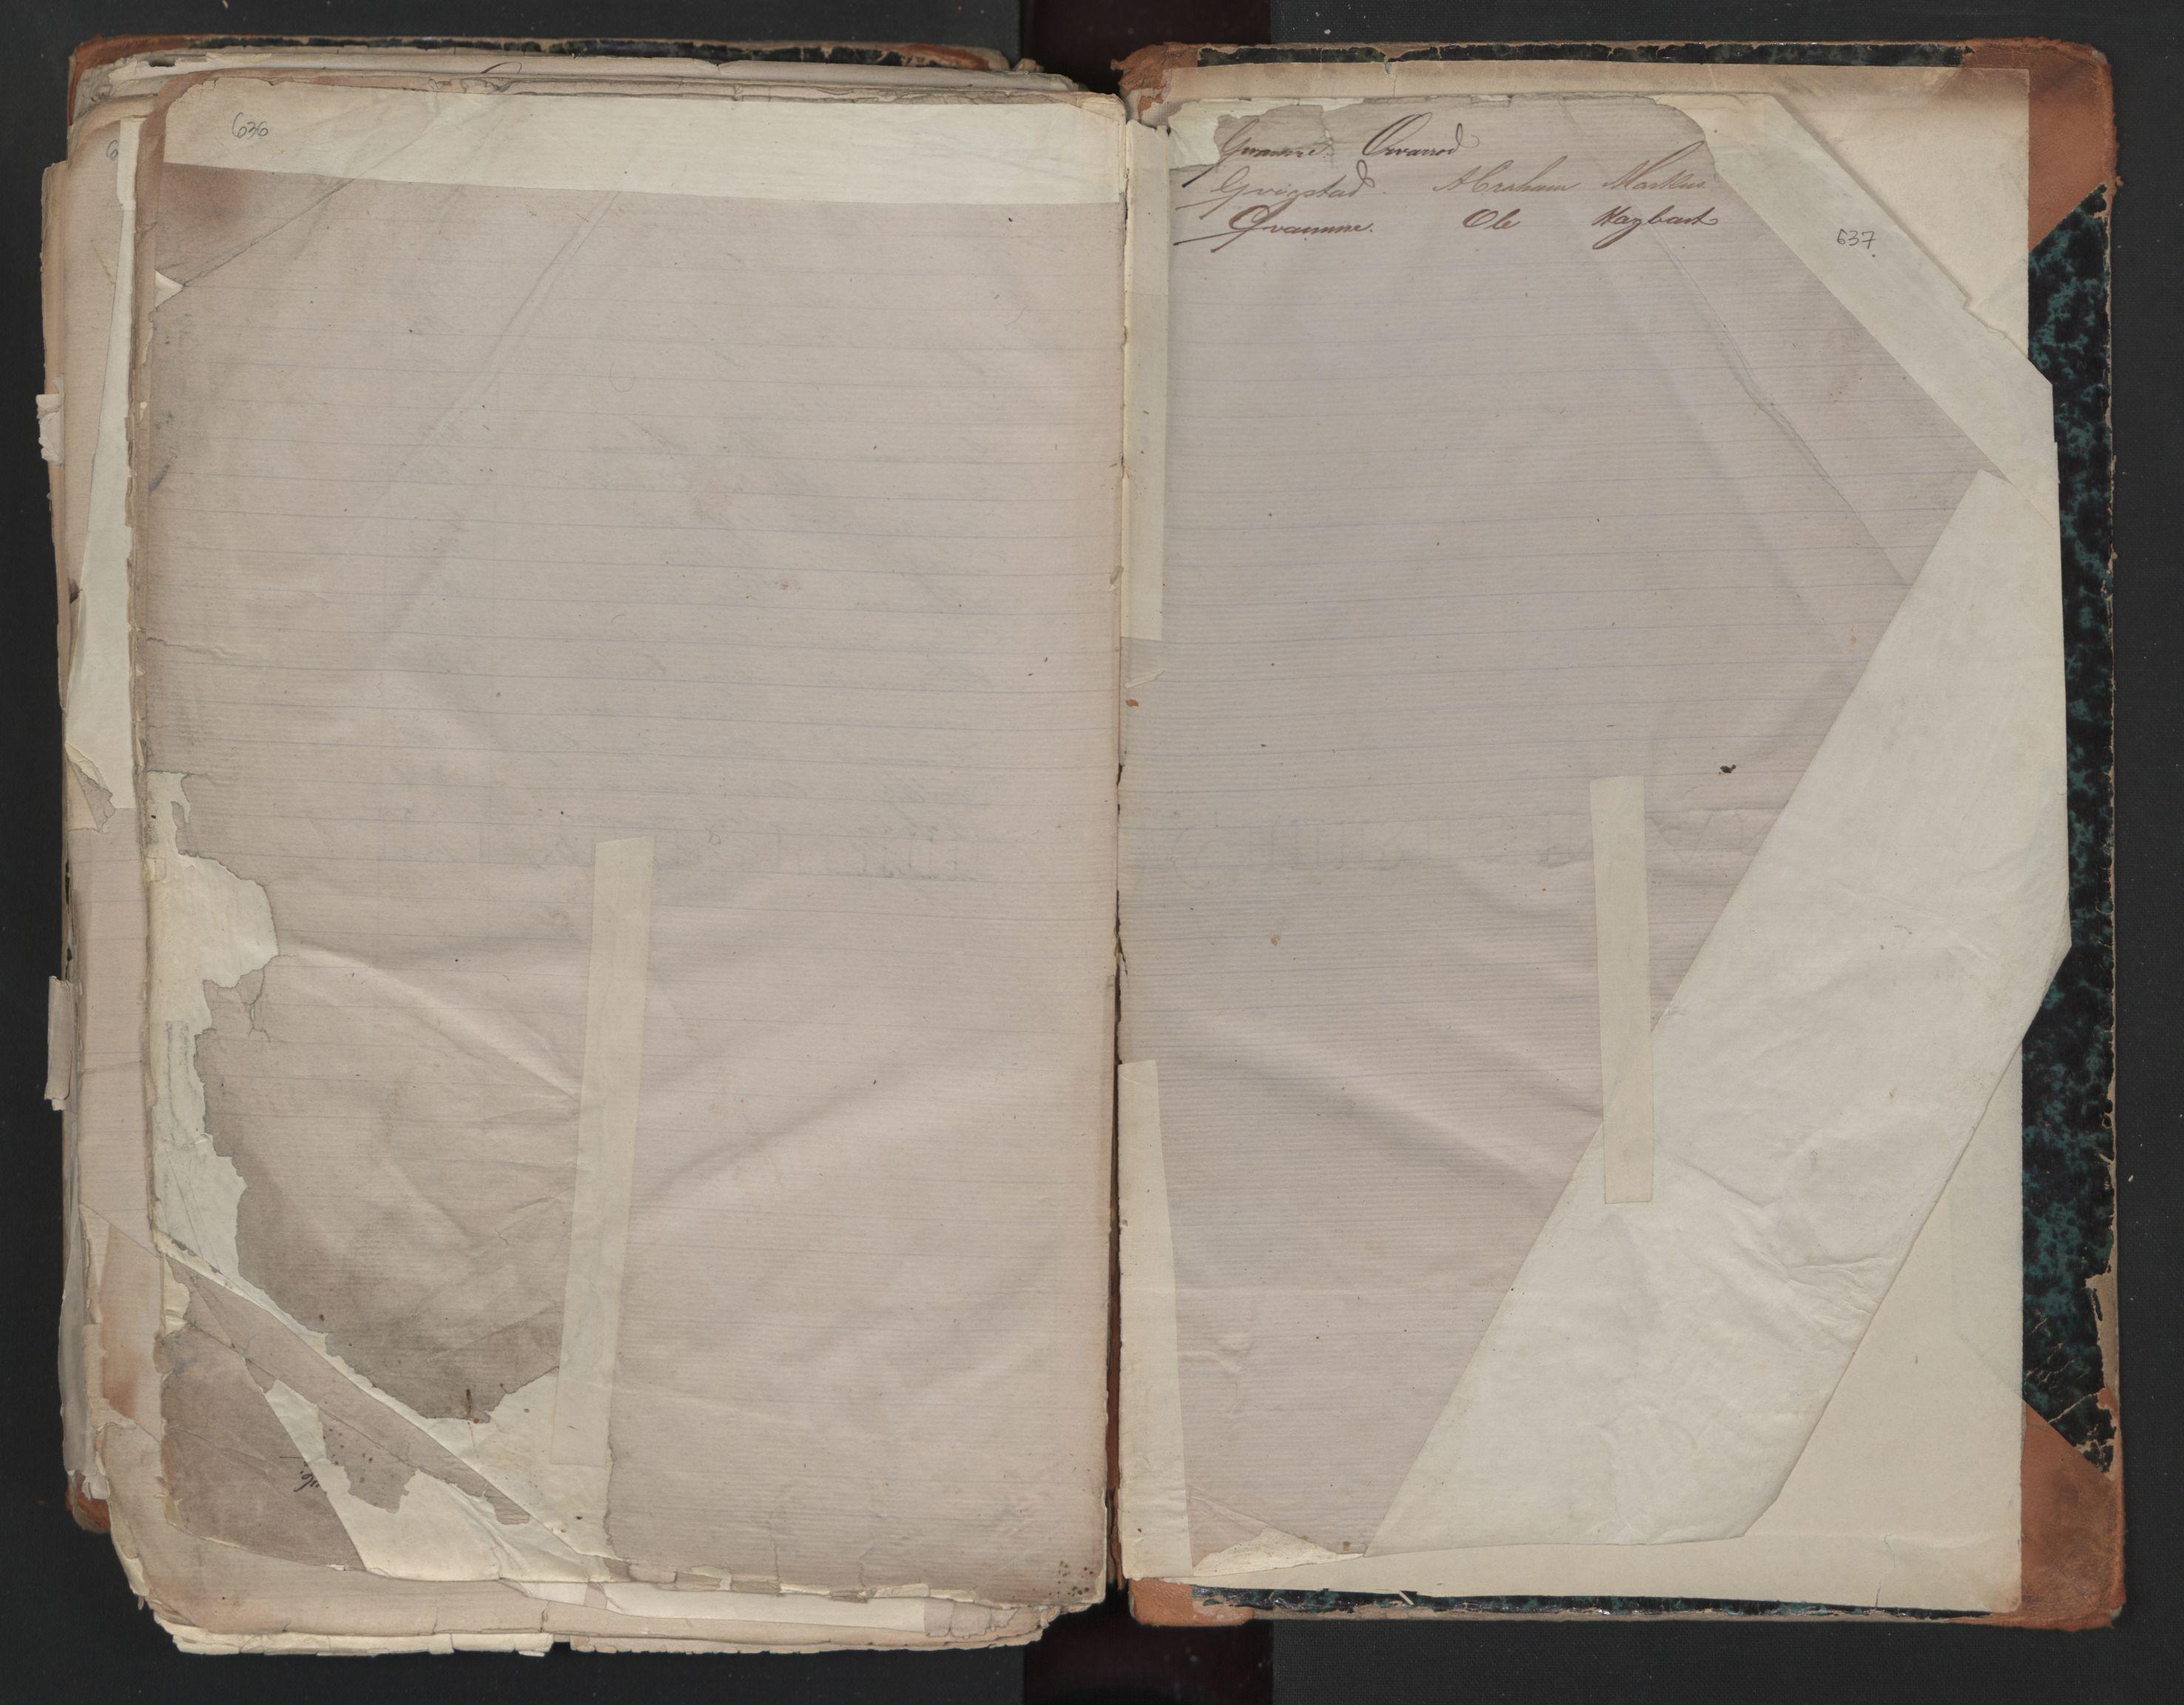 SAO, Oslo sjømannskontor, F/Fa/L0001: Register for Kristiania krets, 1866-1891, s. 636-637